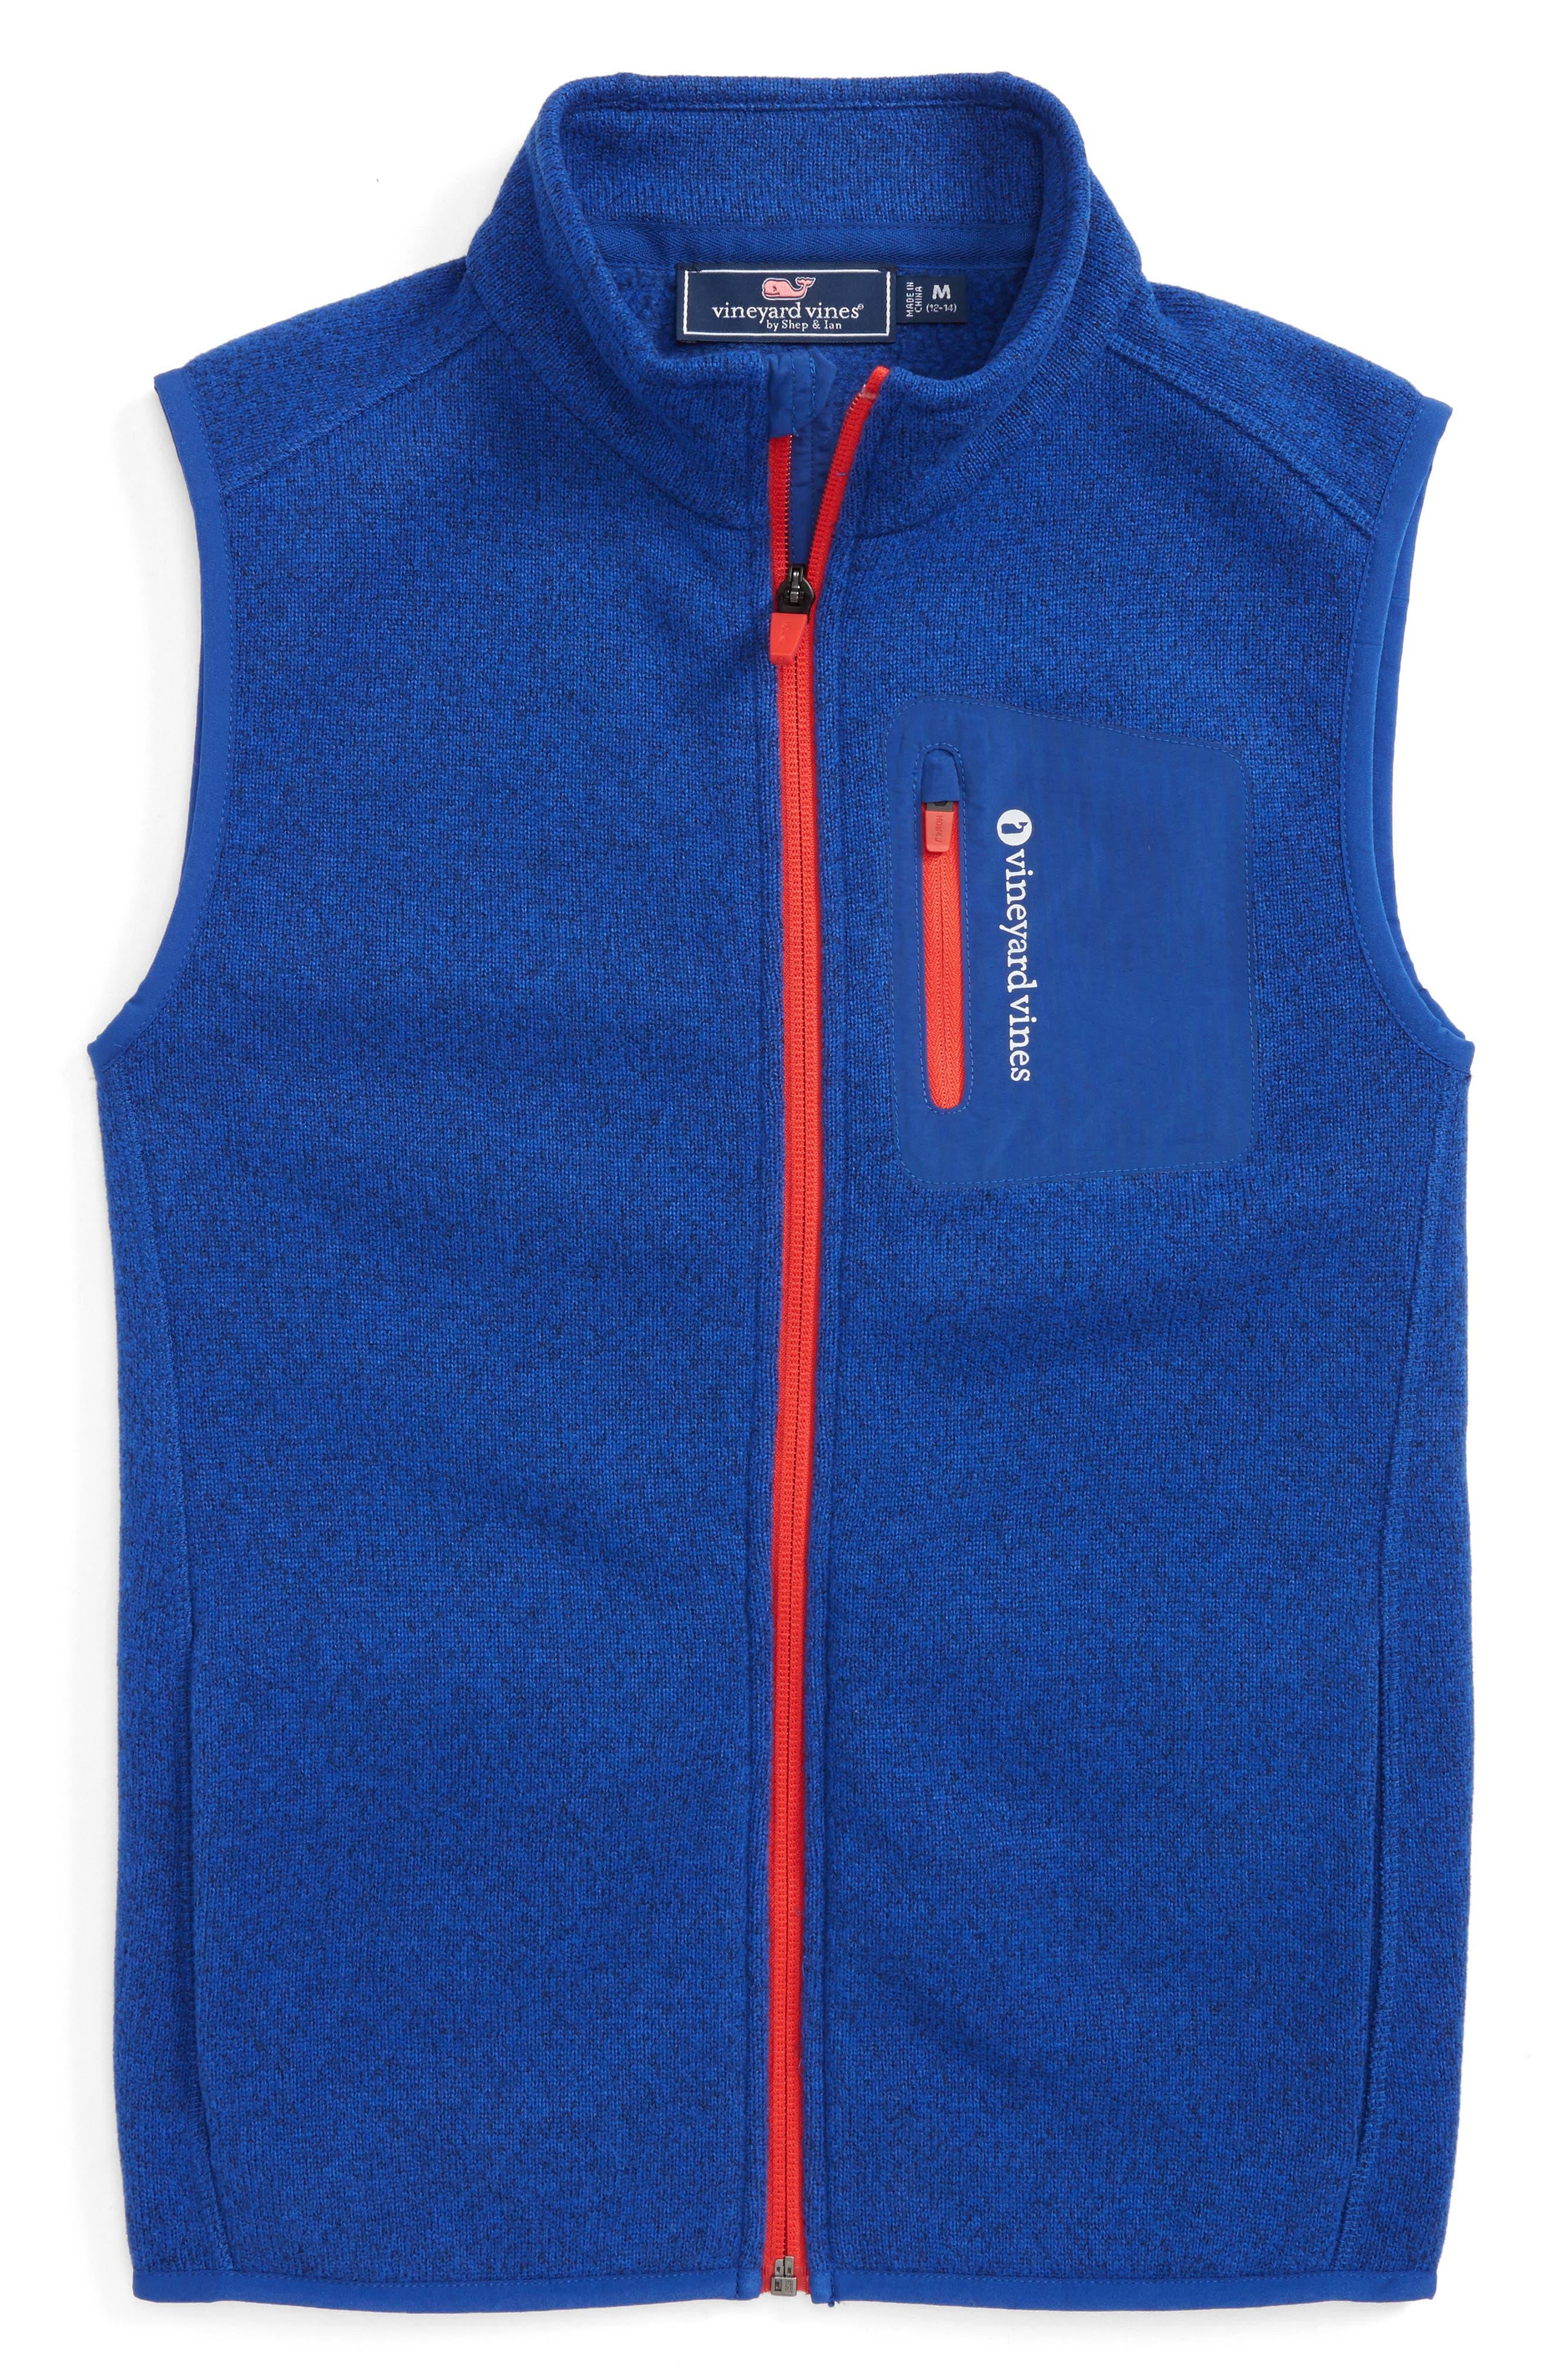 Sweater Vest,                         Main,                         color, Blue Bay